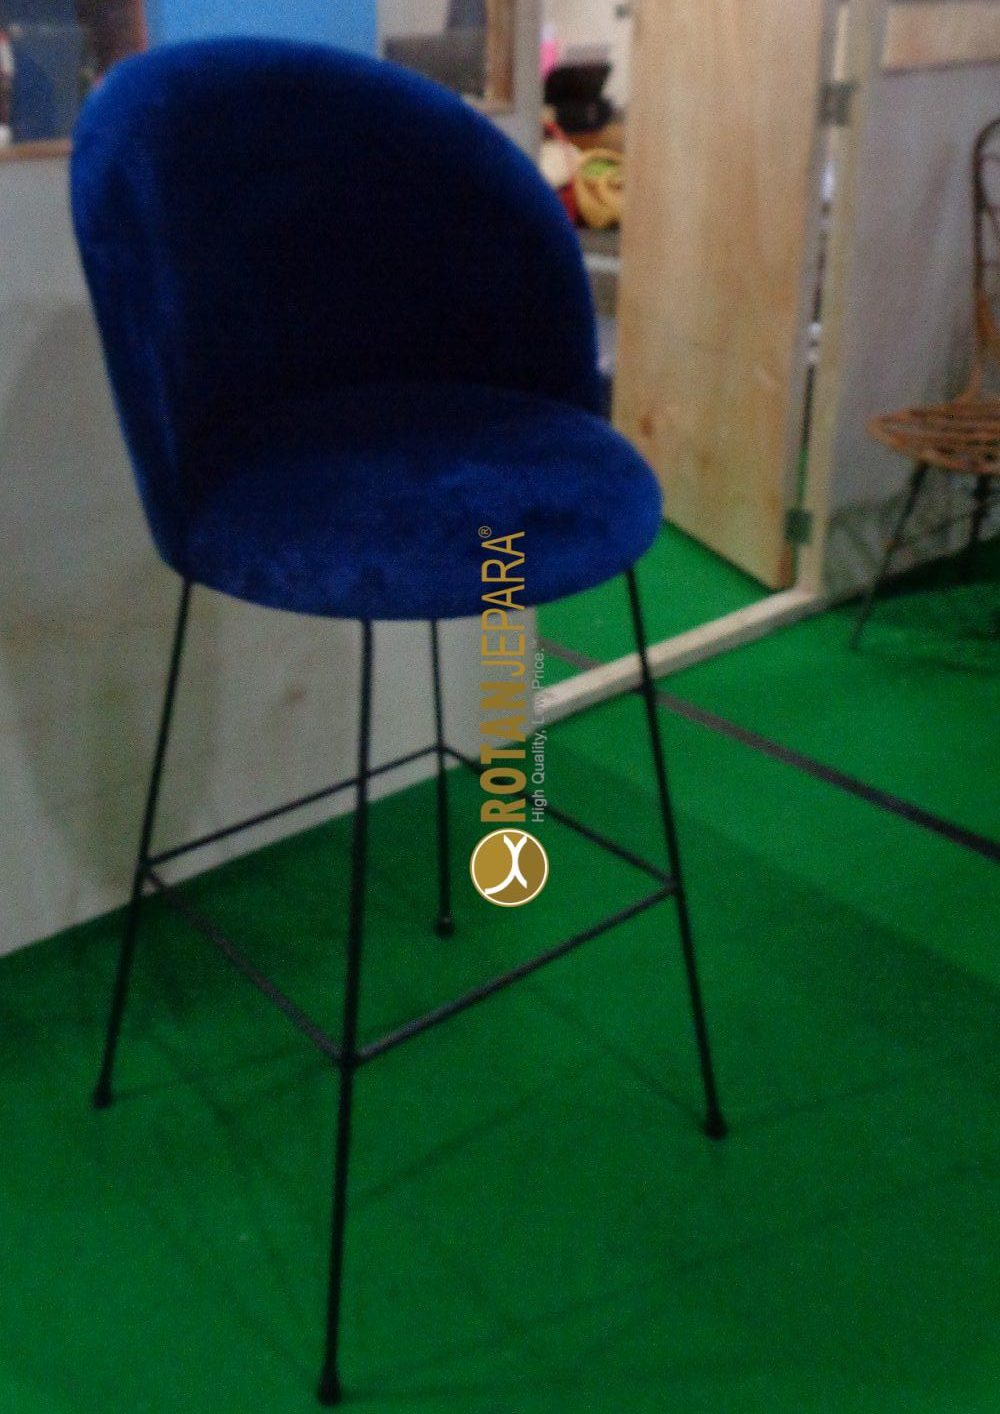 Orlando Bar Chair Cafe Decor Furniture